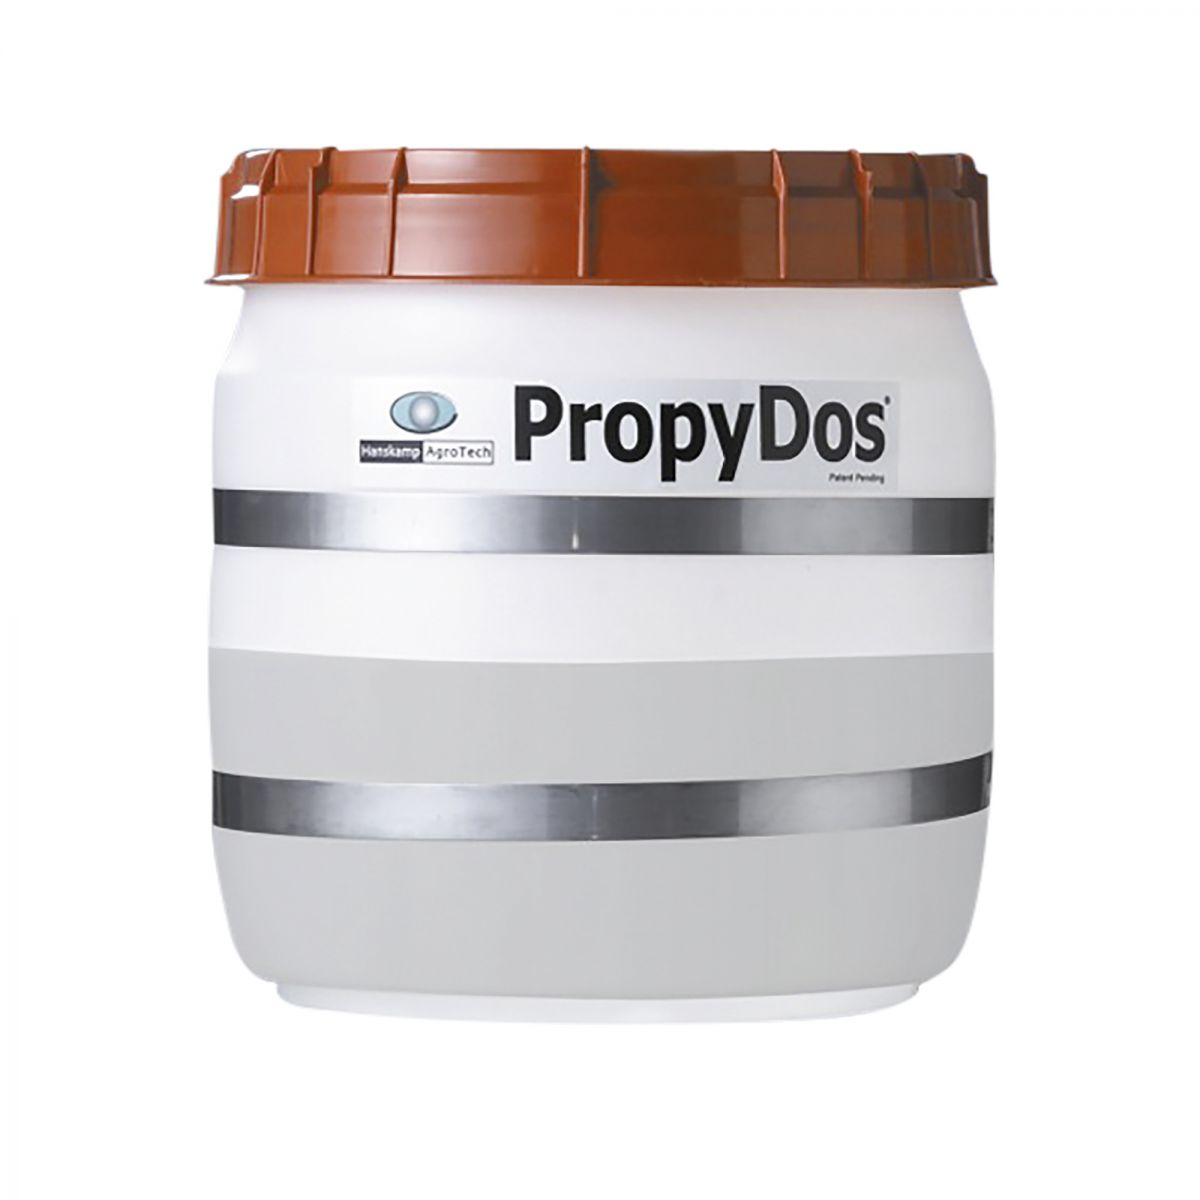 container propydos 265 l transparant